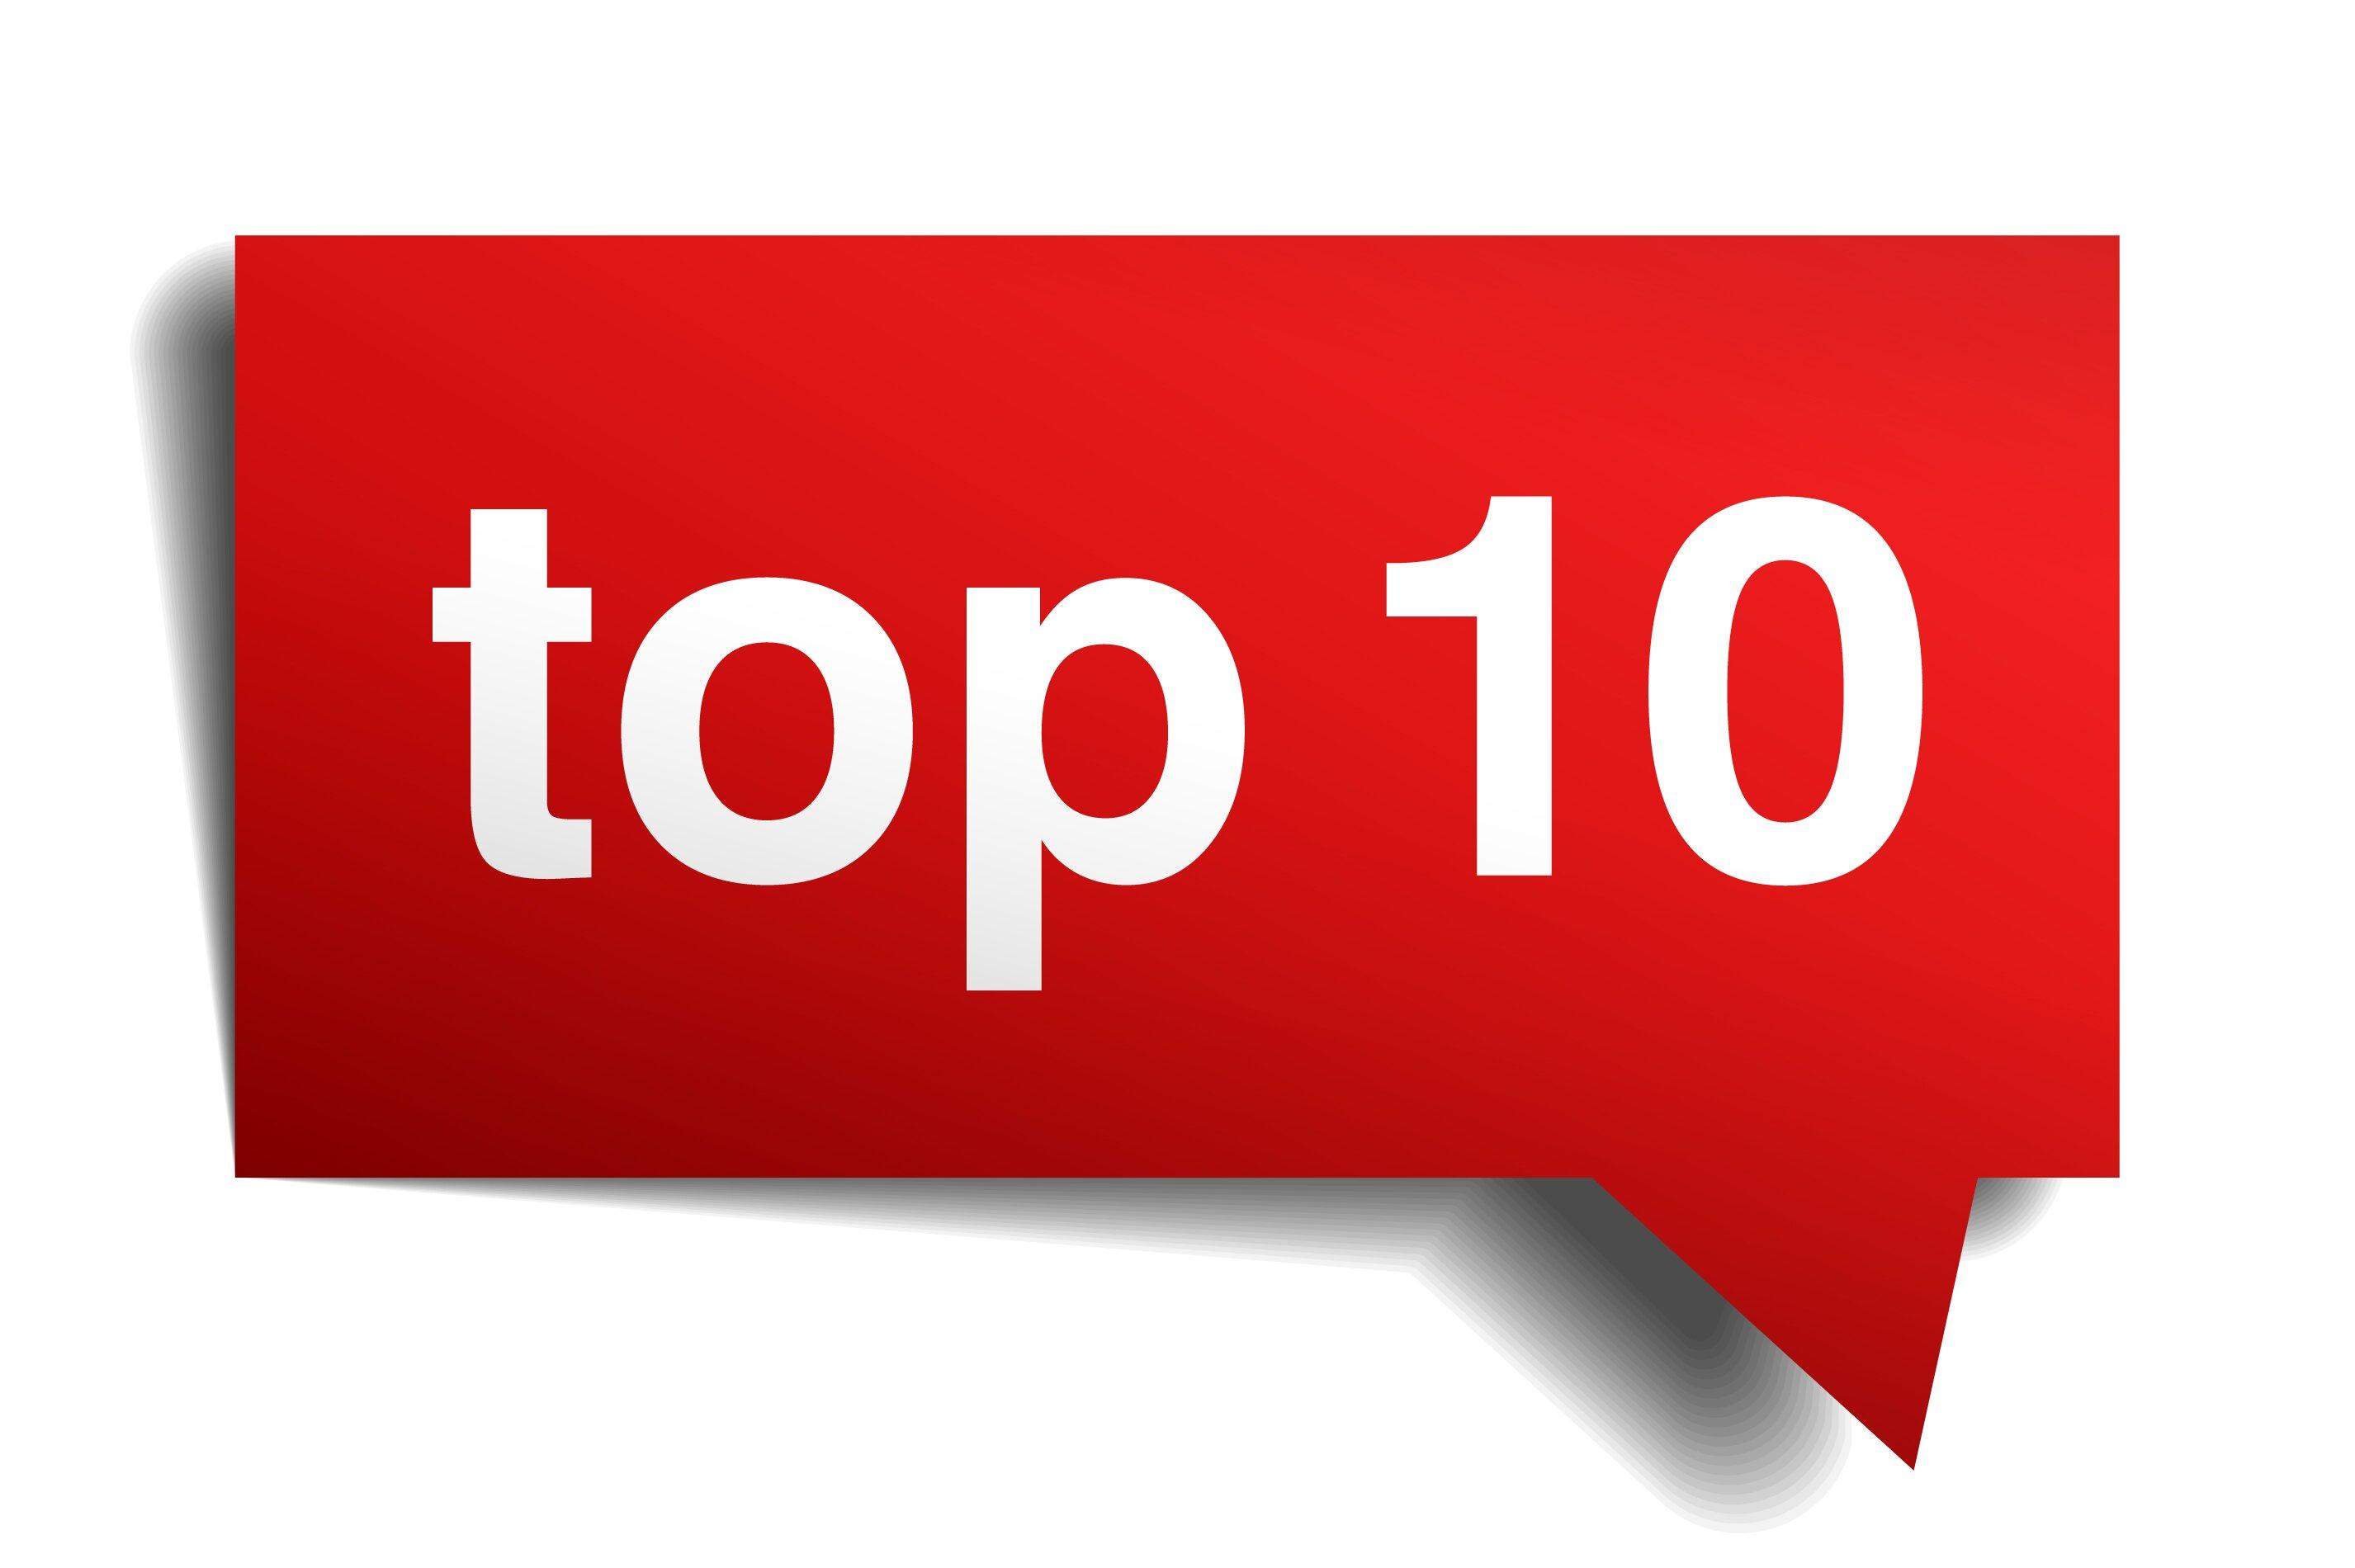 http://startupline.com.ua/wp-content/uploads/2015/11/top-10.jpg